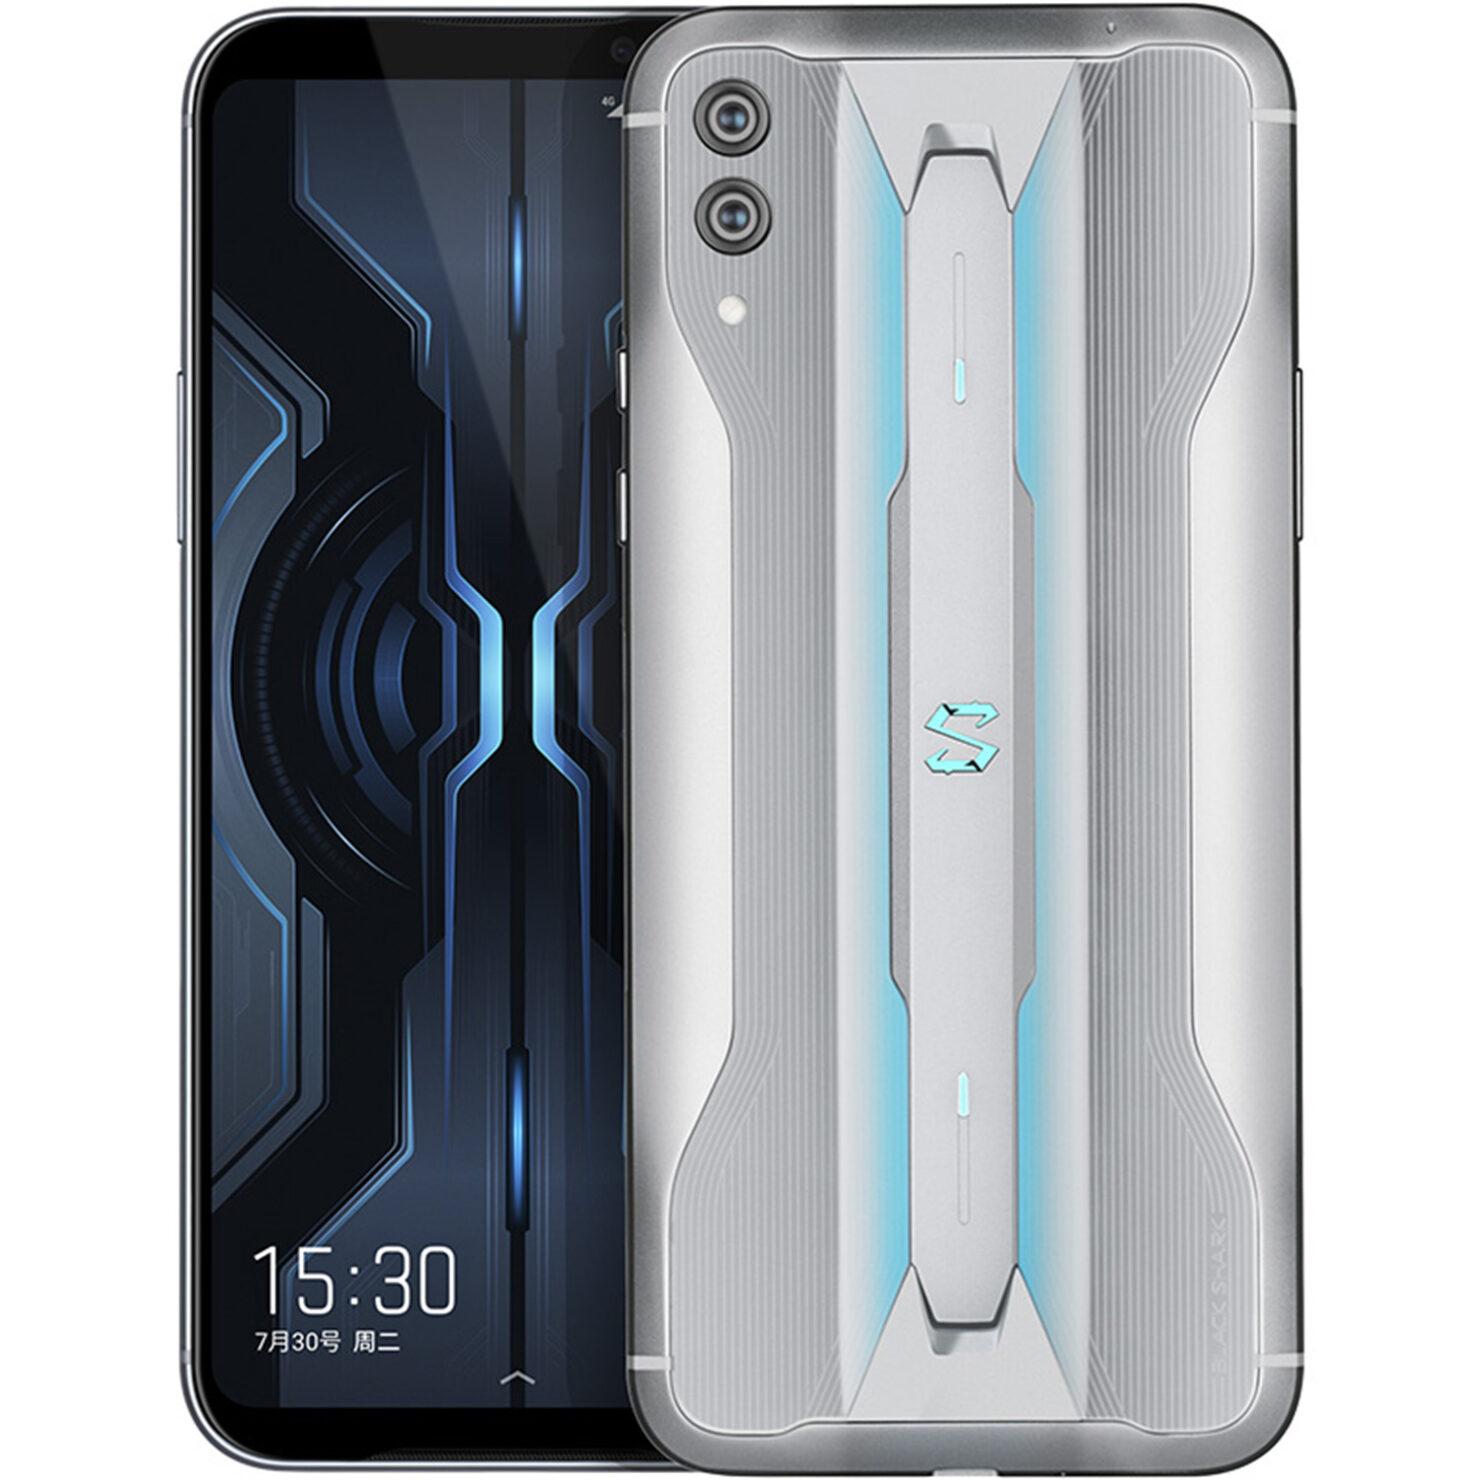 Xiaomi's Black Shark 2 Pro has finally launched